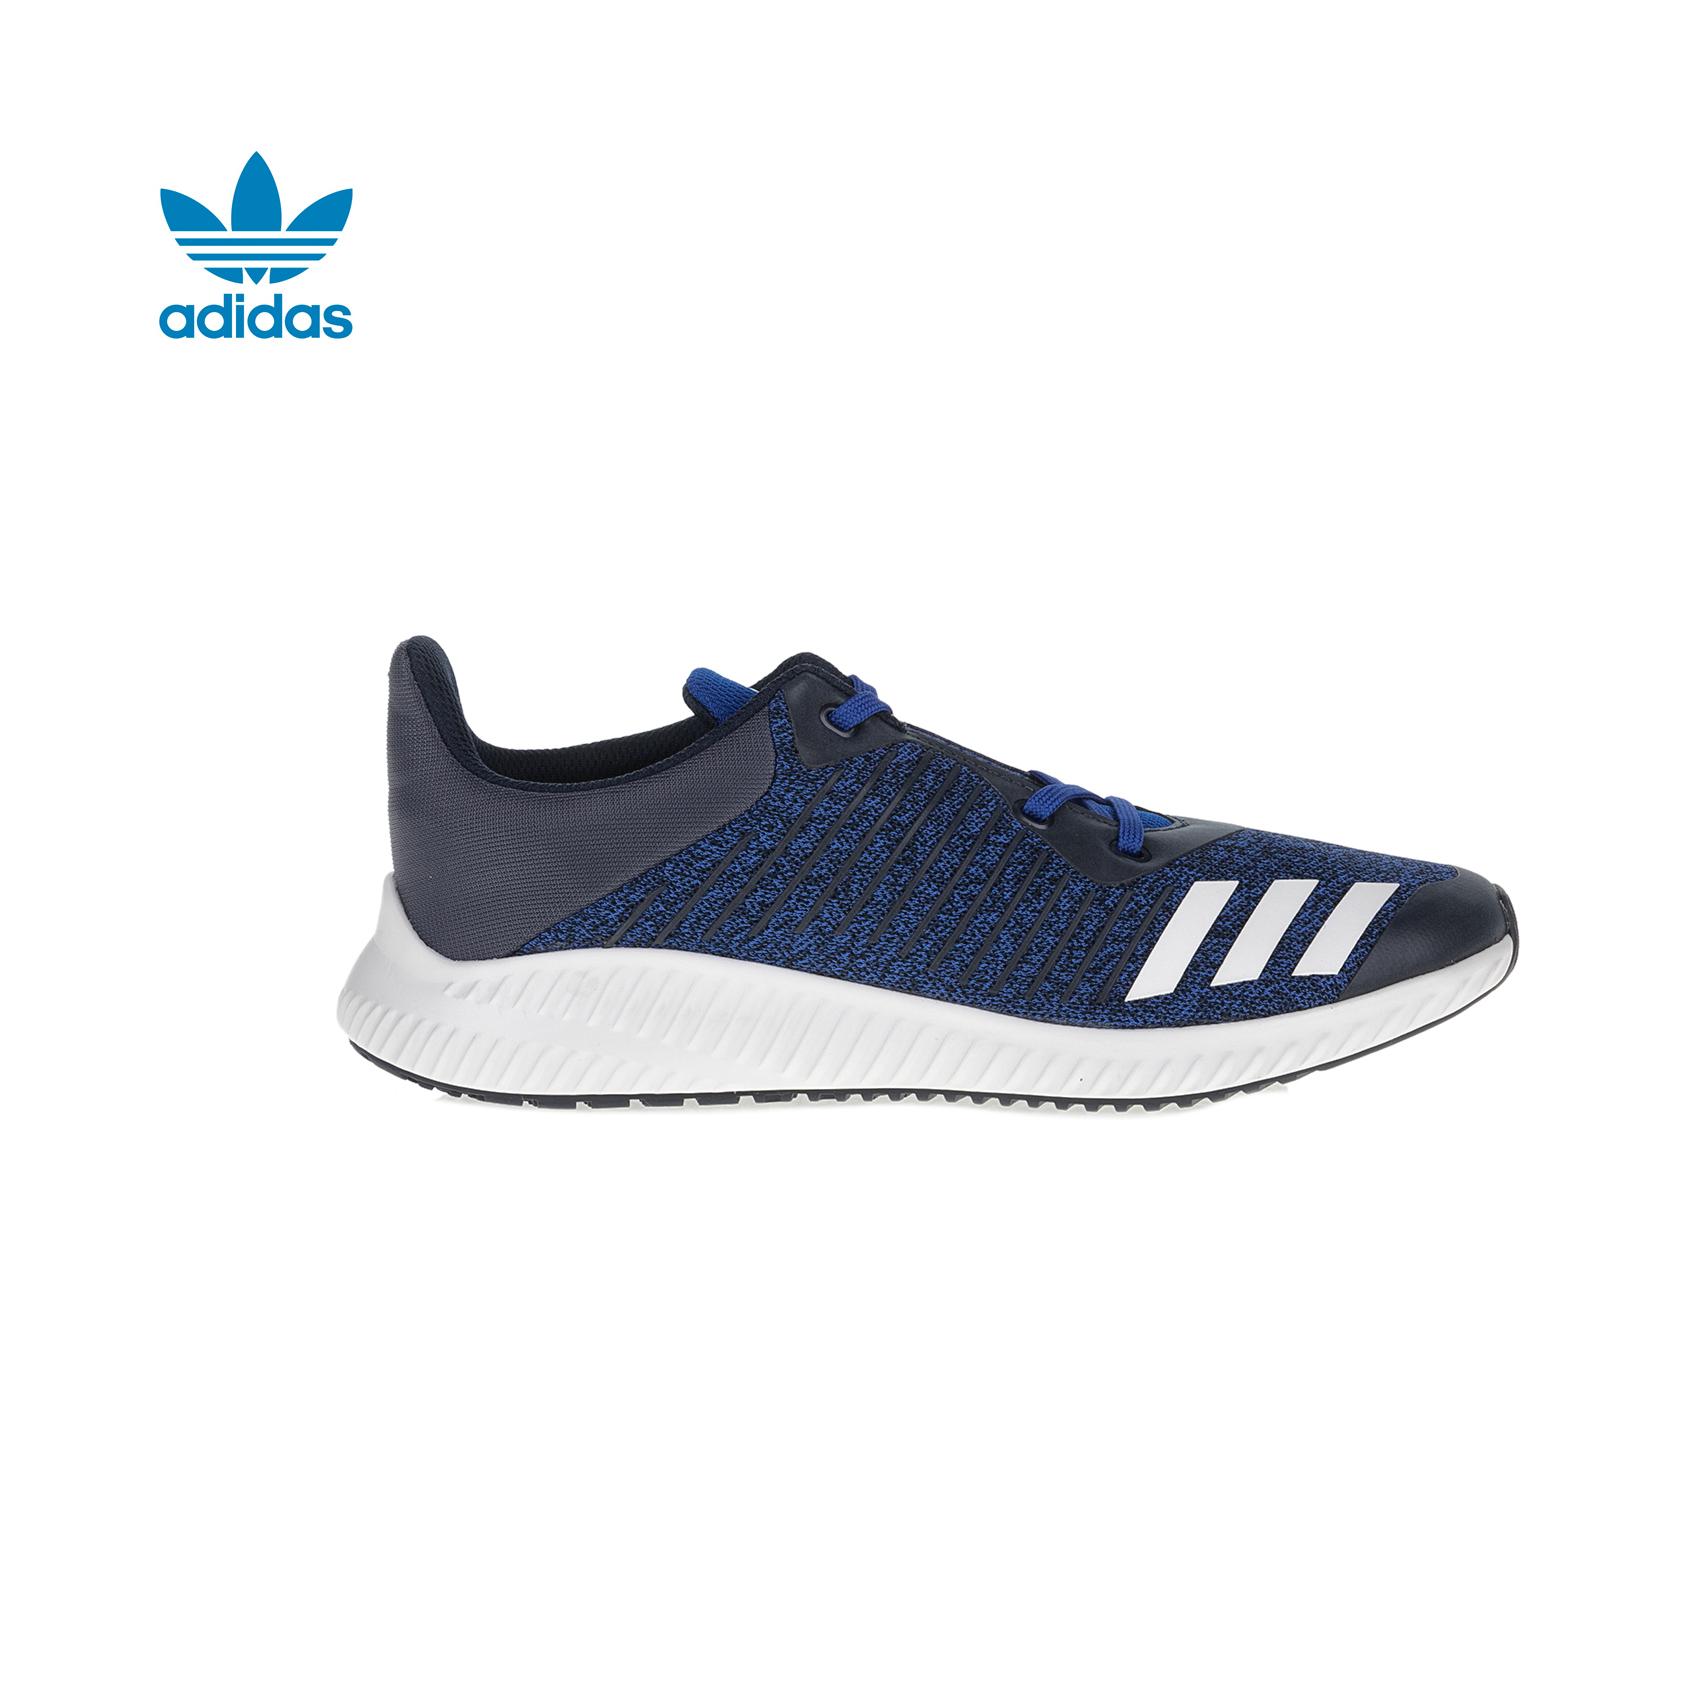 save off 84652 cbb0d adidas Originals - Παιδικά παπούτσια adidas FortaRun K μπλε